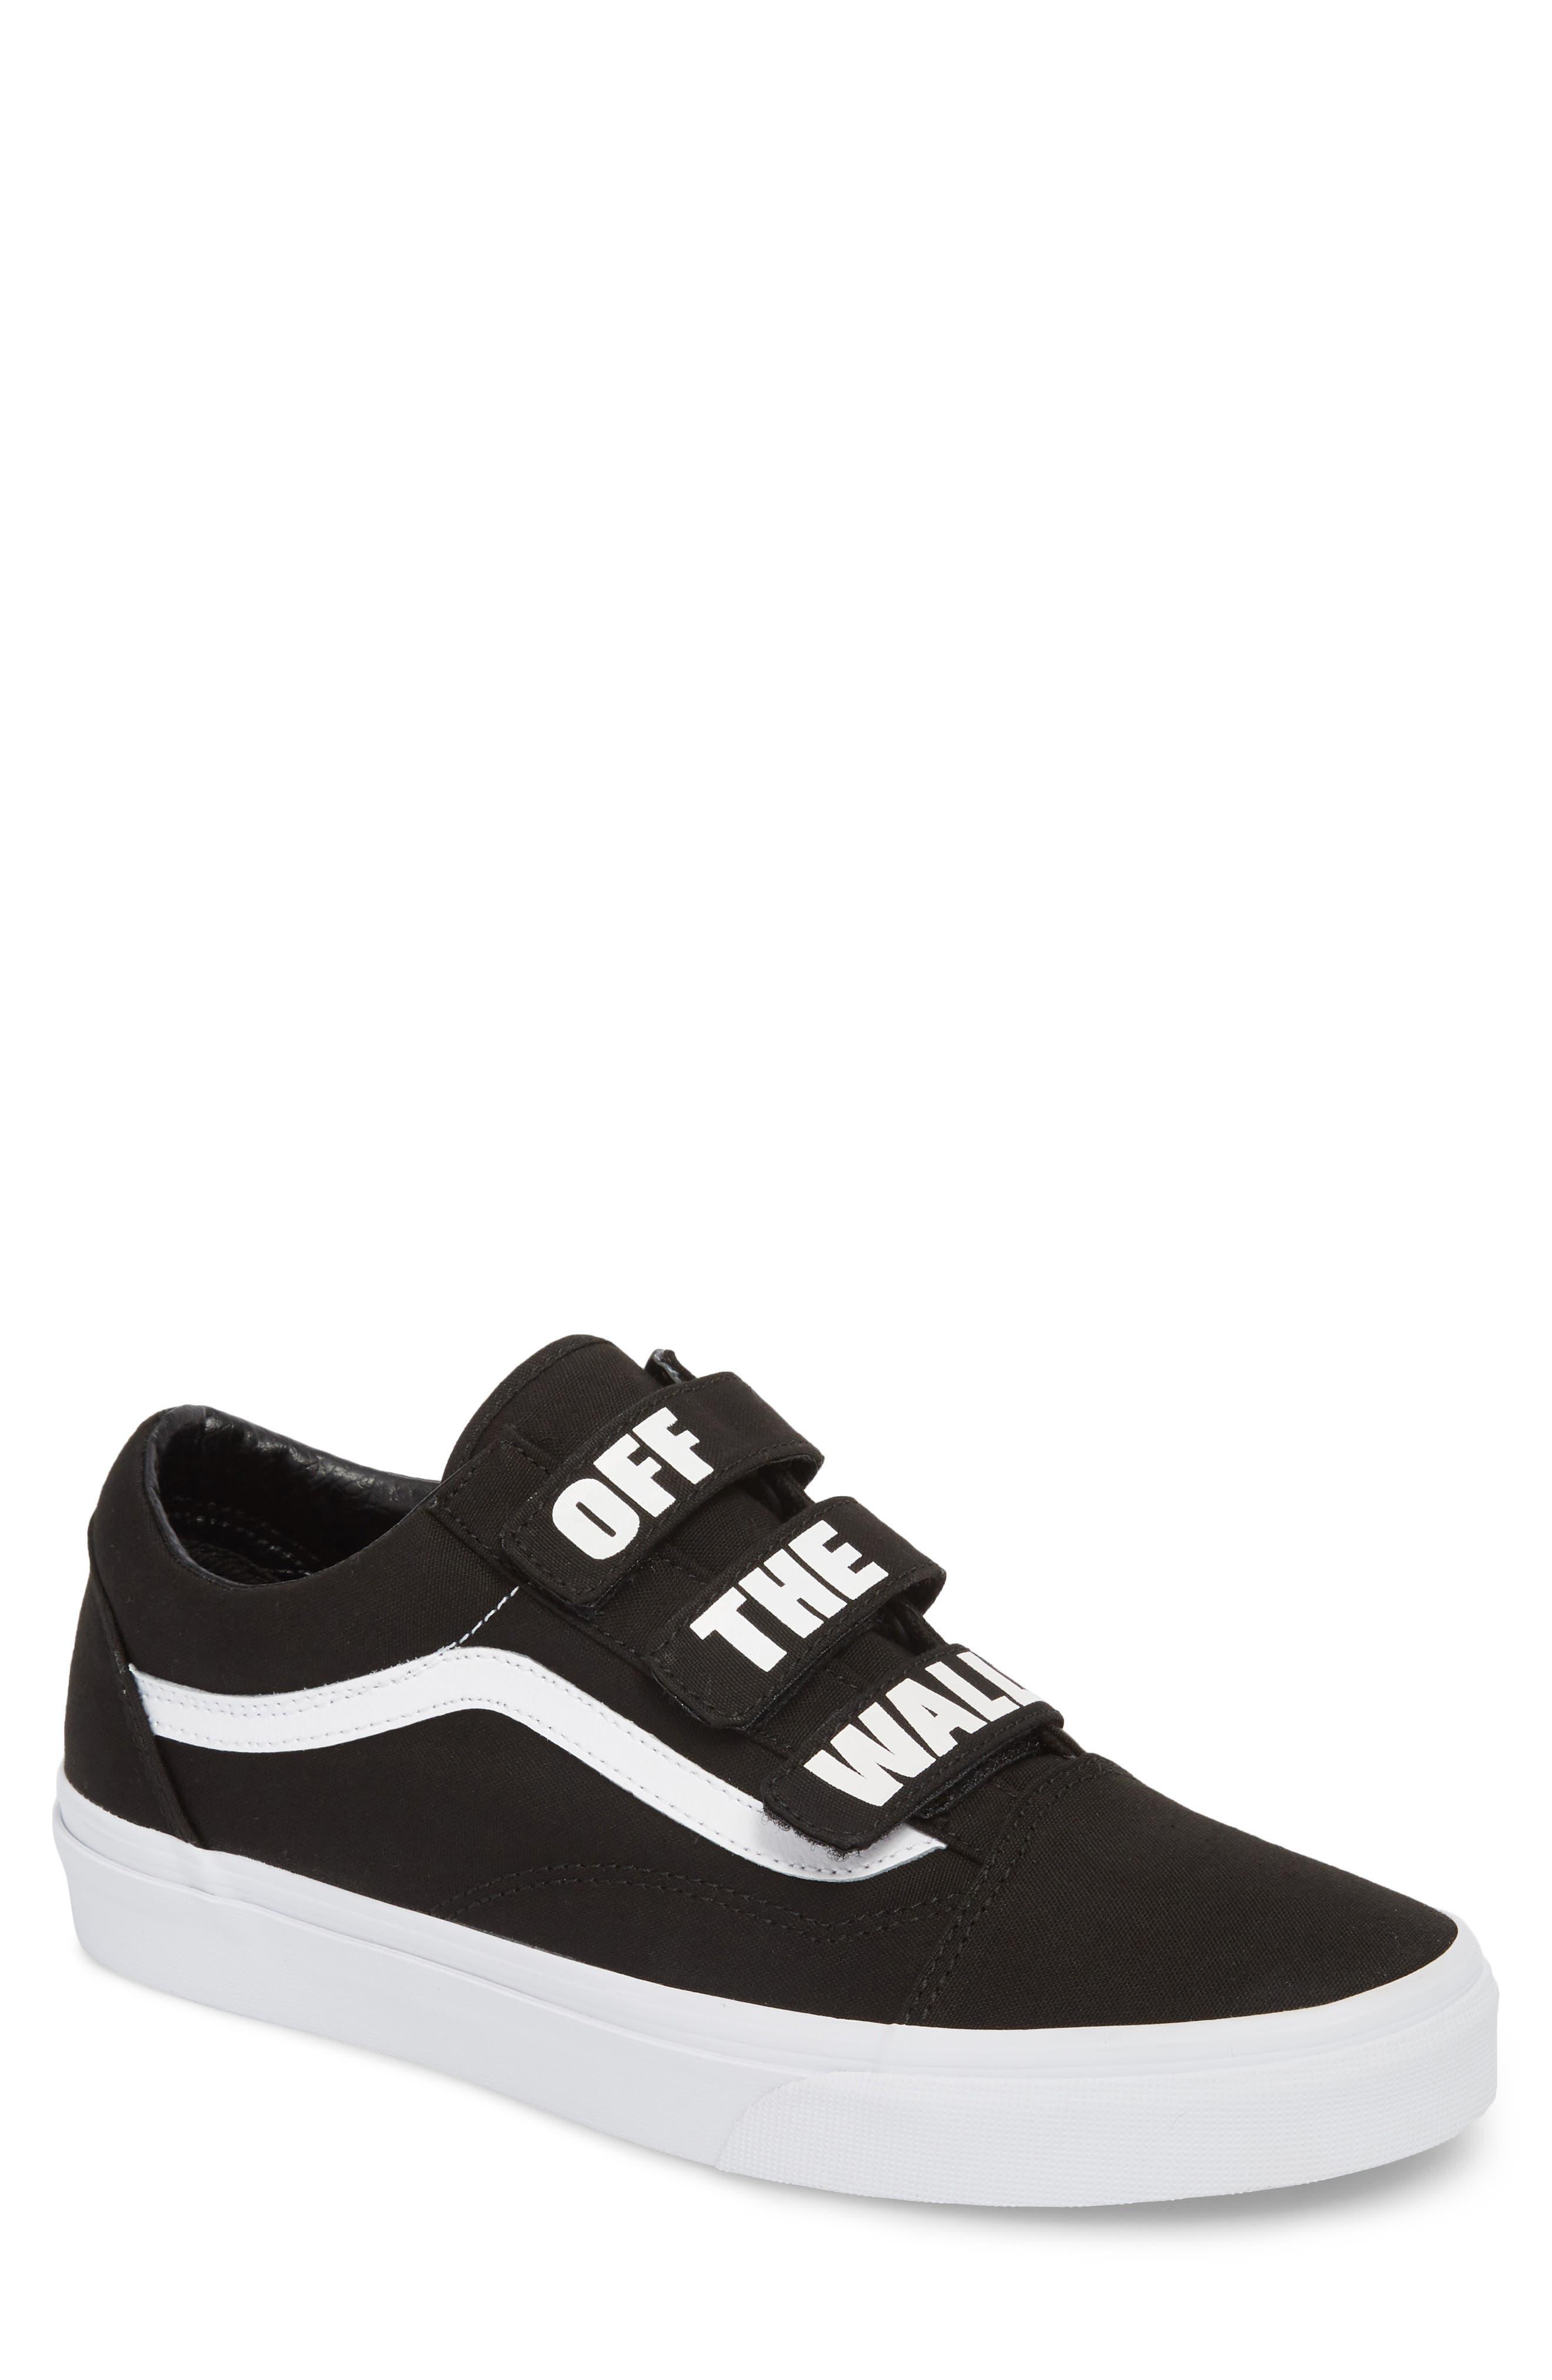 Vans Off the Wall Old Skool V Sneaker (Men)